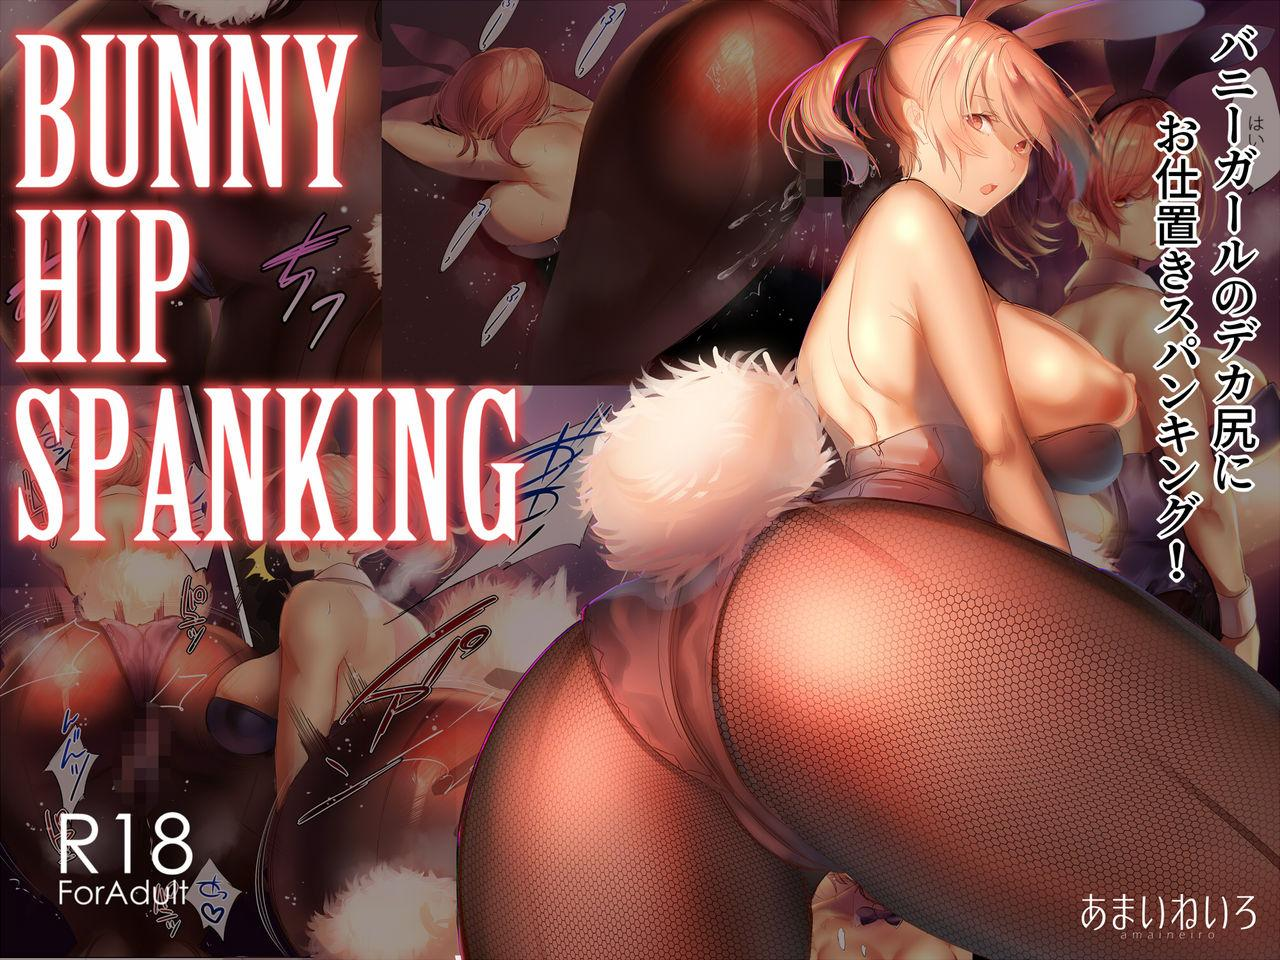 BUNNY HIP SPANKING 0